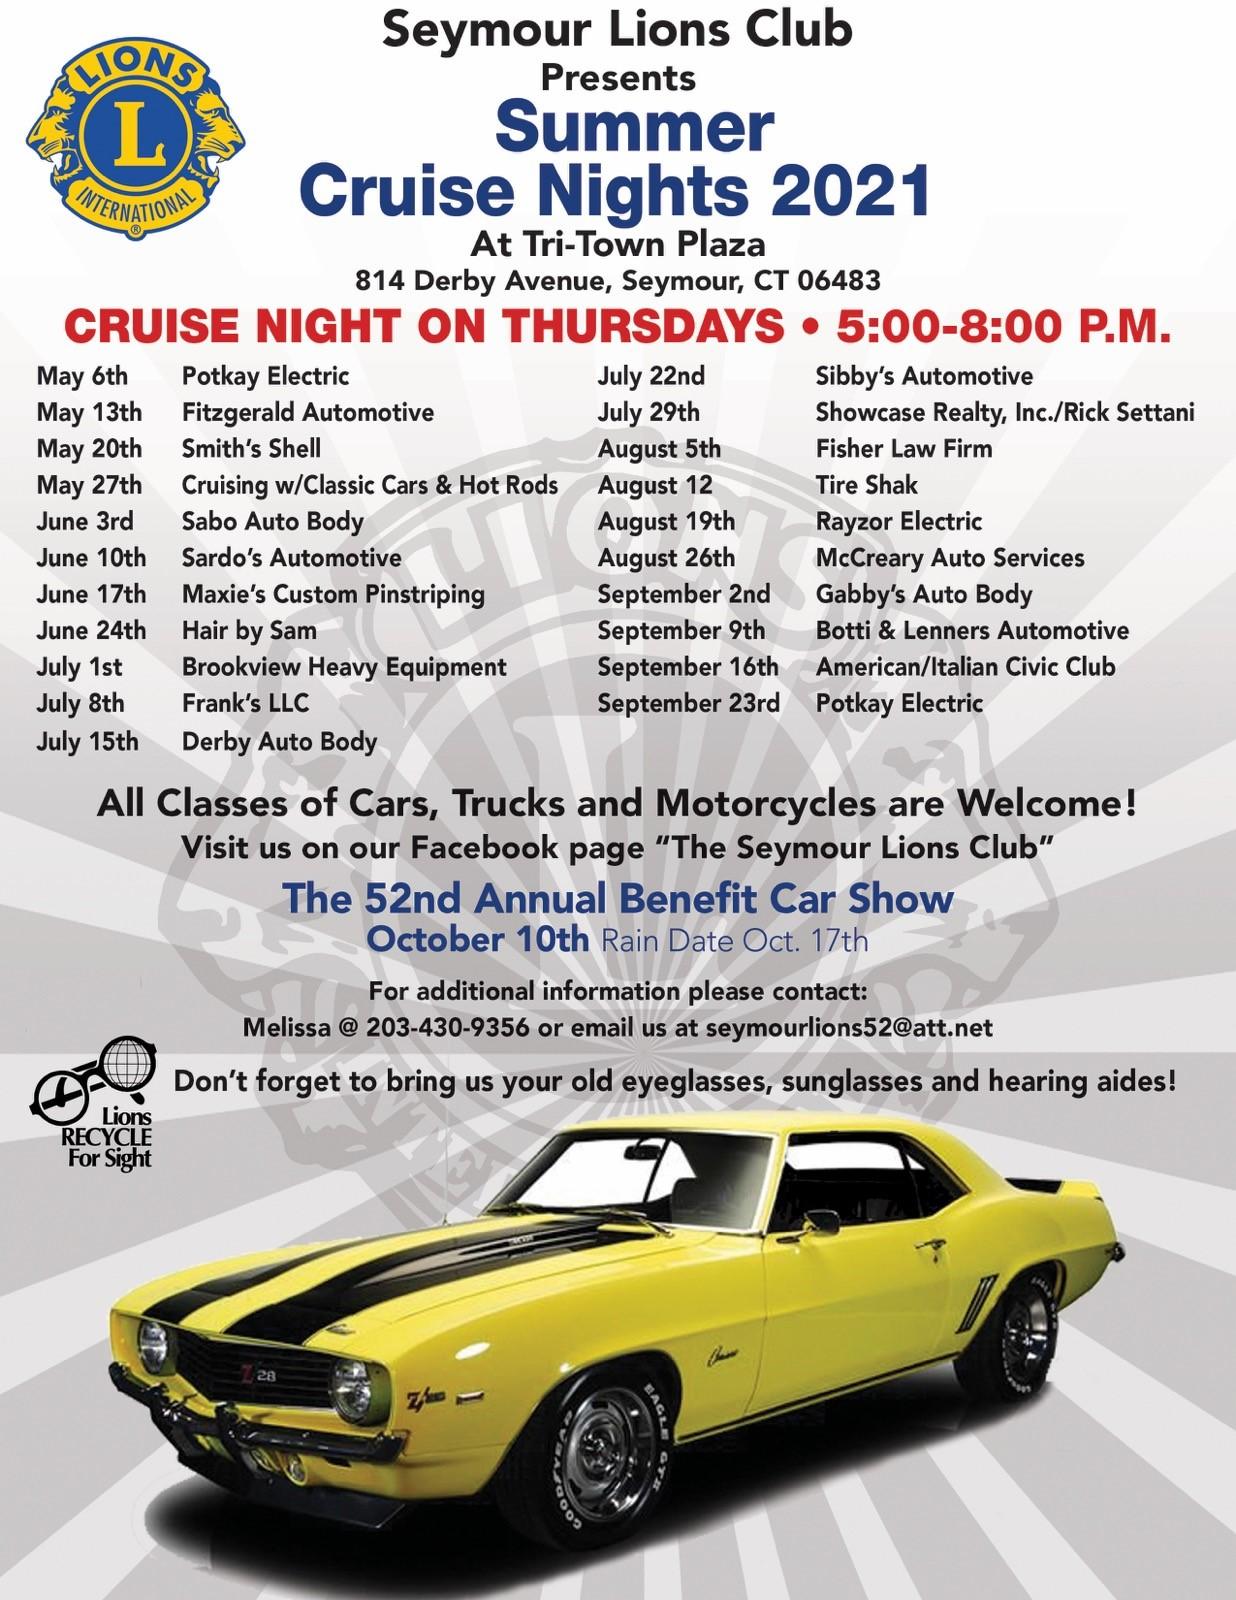 Summer Cruise Nights